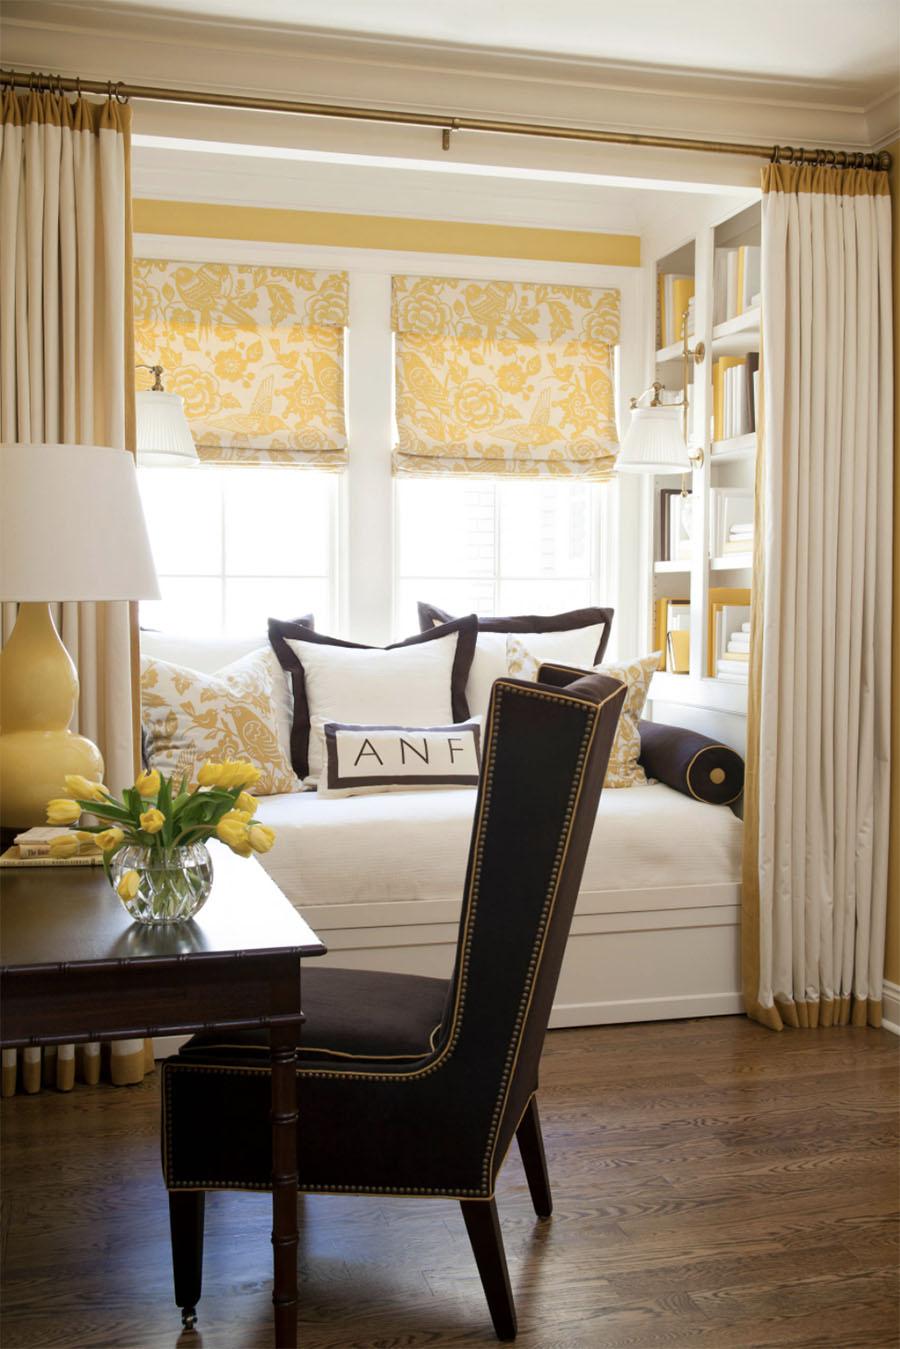 bay window seat small dining area yellow